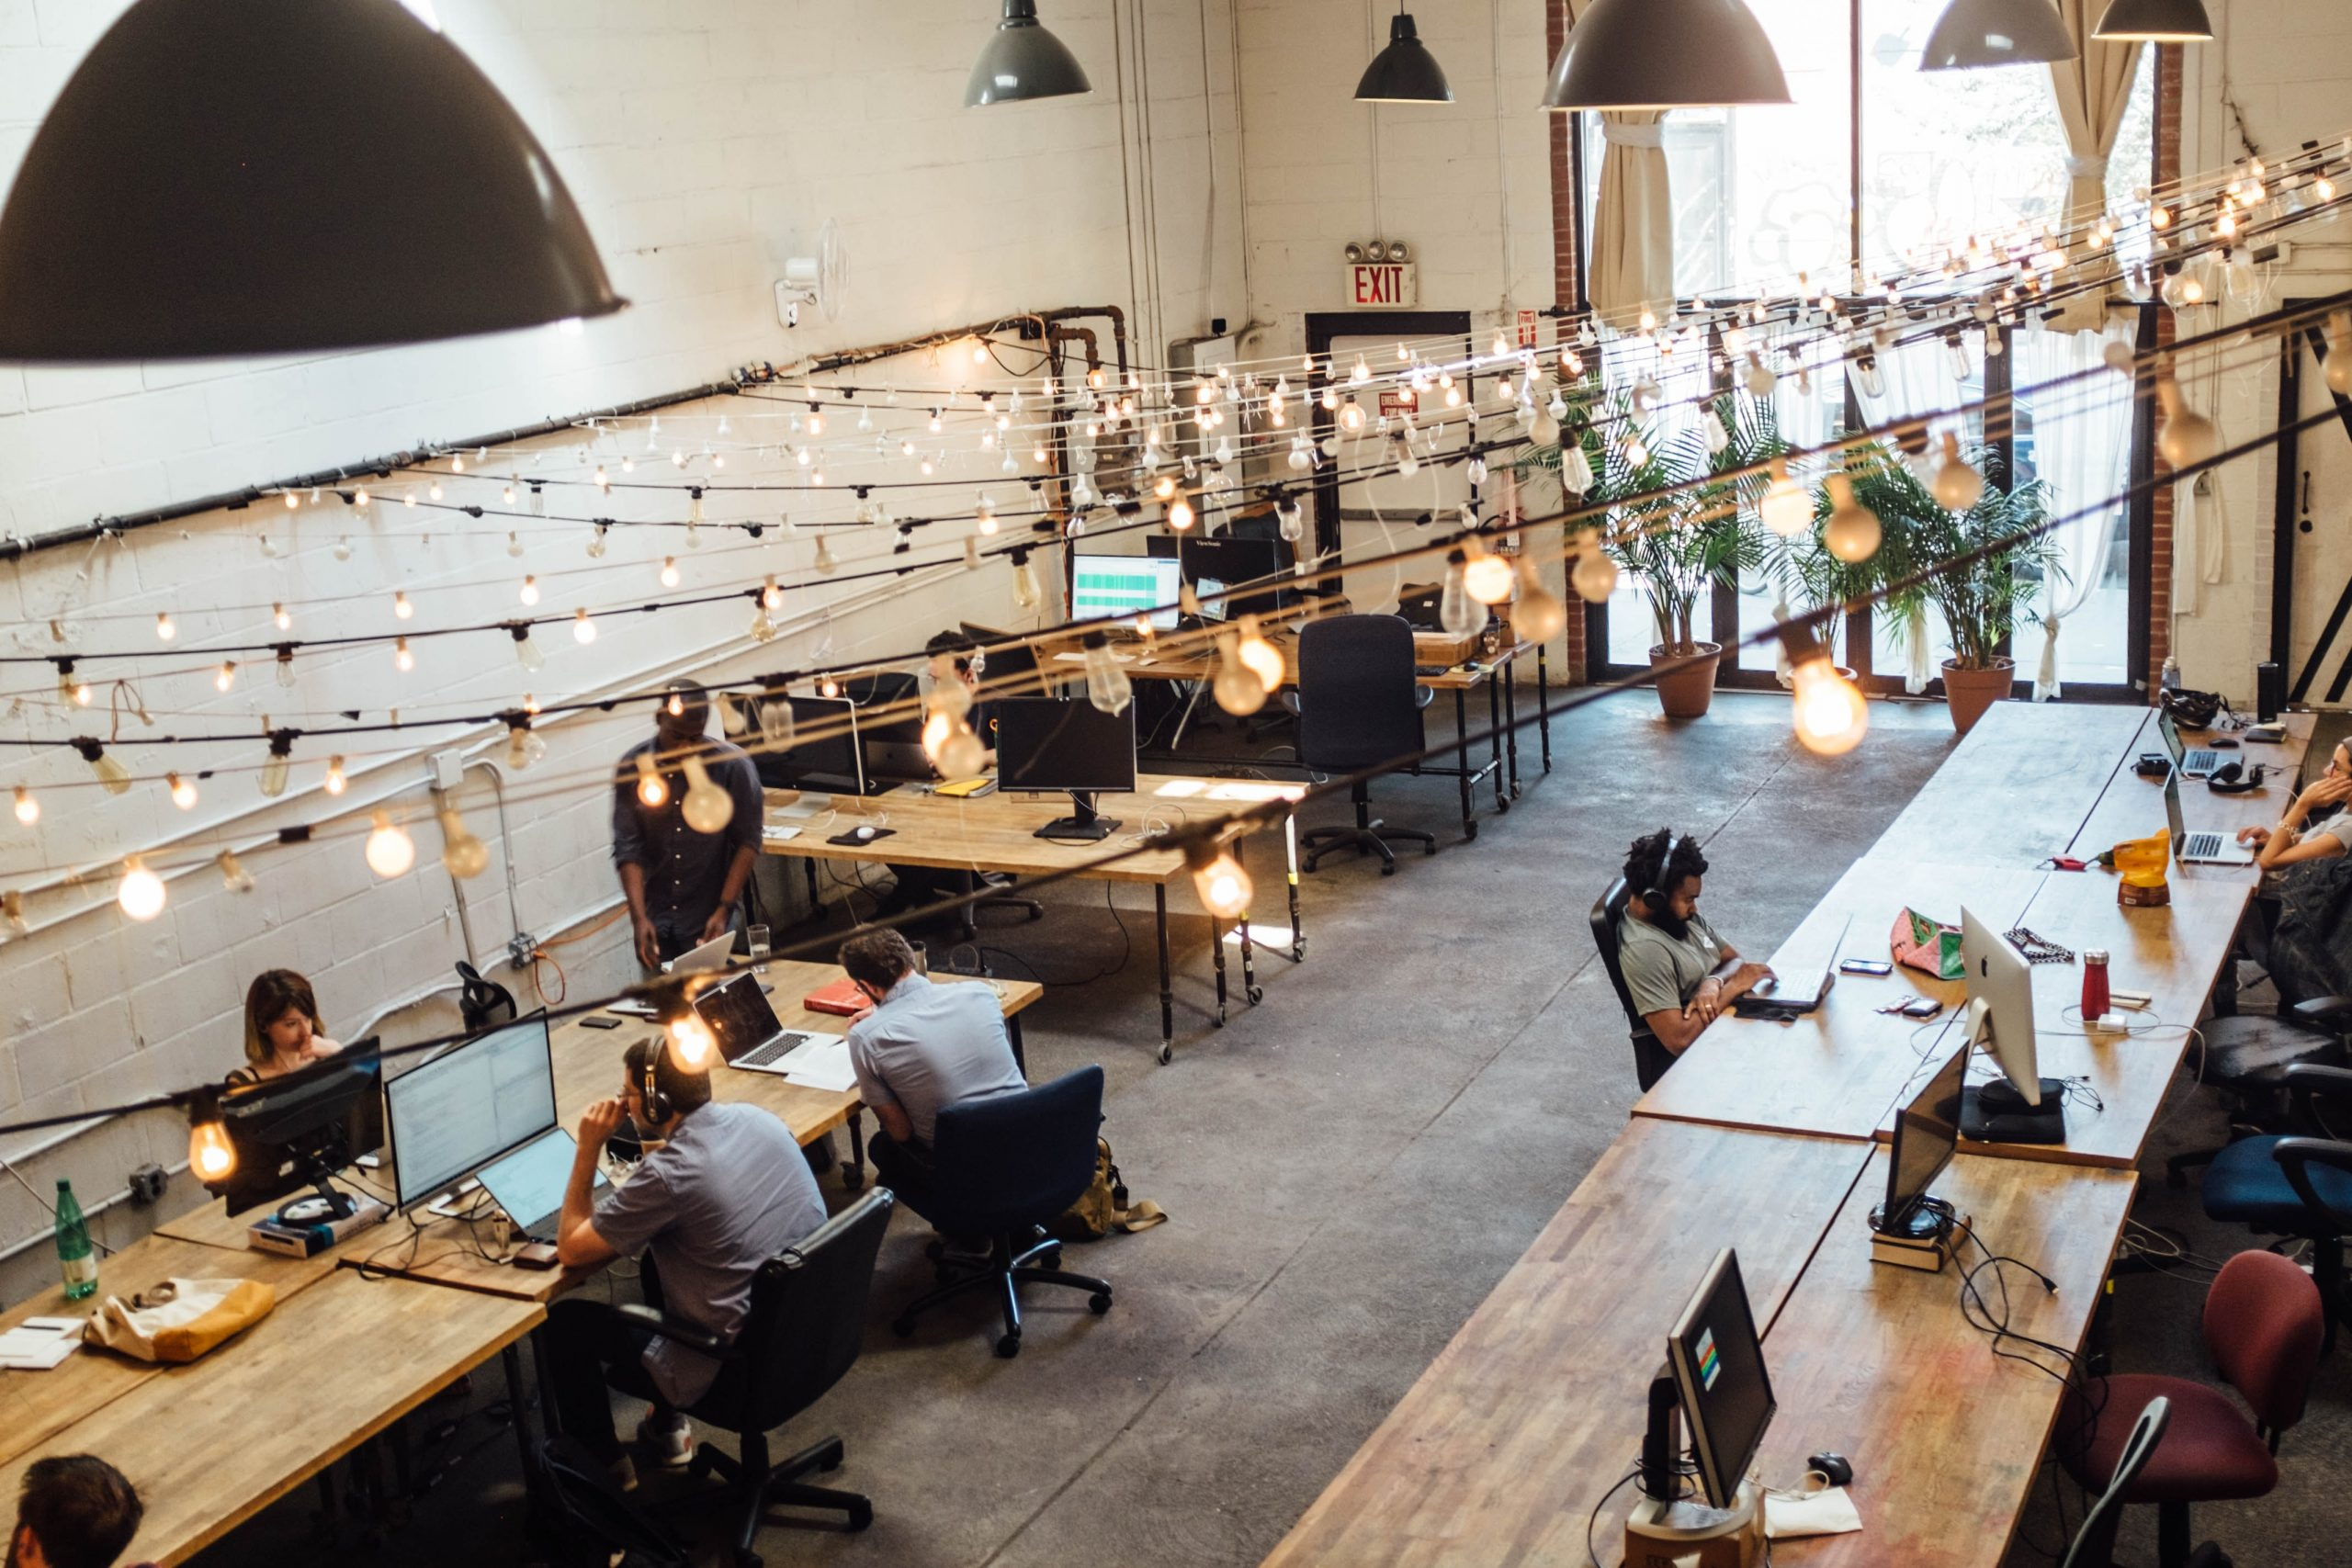 smart-office-example-people-working-iot-startup-team-smart-building